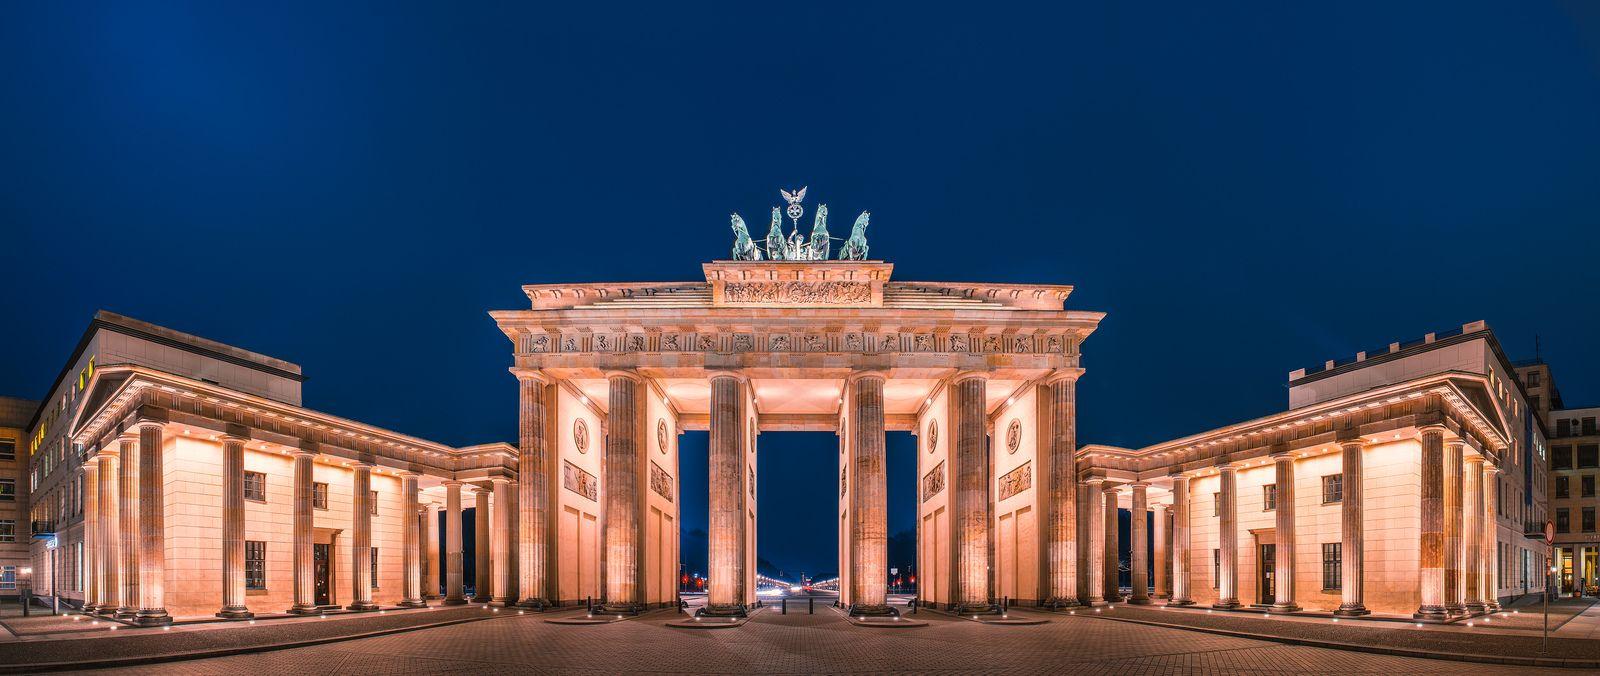 Berlin Brandenburger Tor Closeup Panorama Visit Germany Panorama Berlin